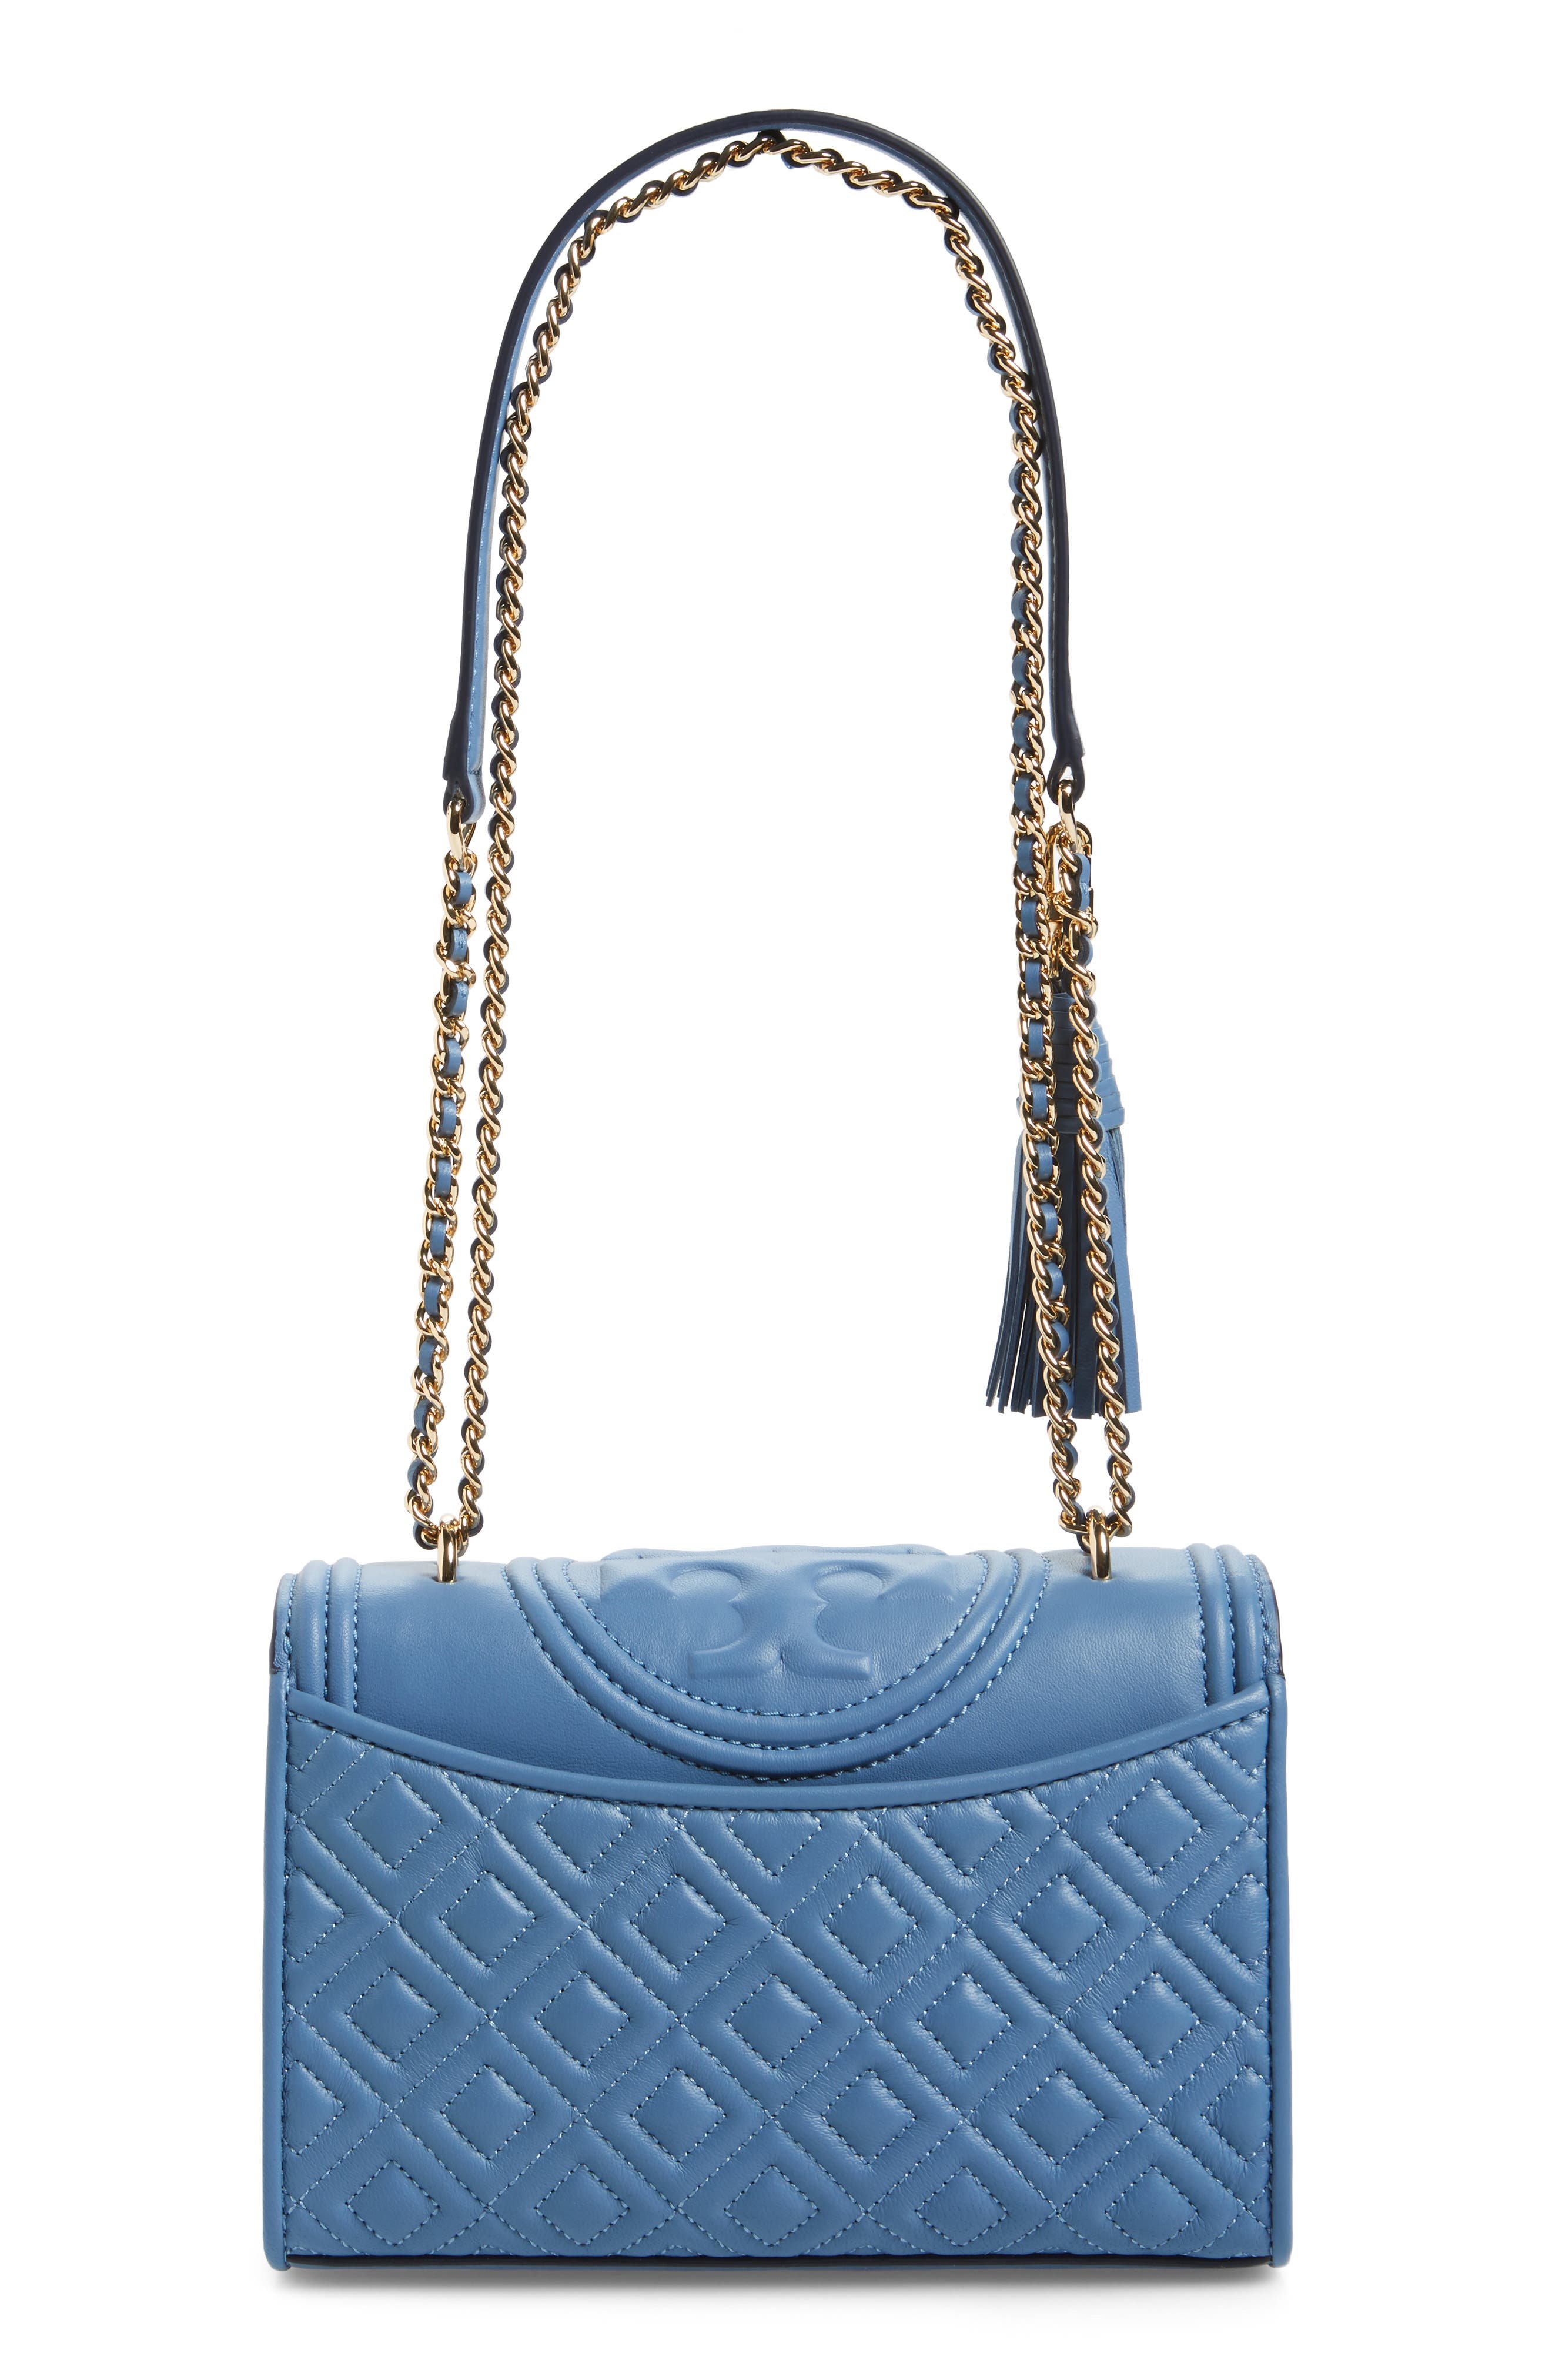 Fleming Convertible Leather Shoulder Bag,                             Alternate thumbnail 3, color,                             401